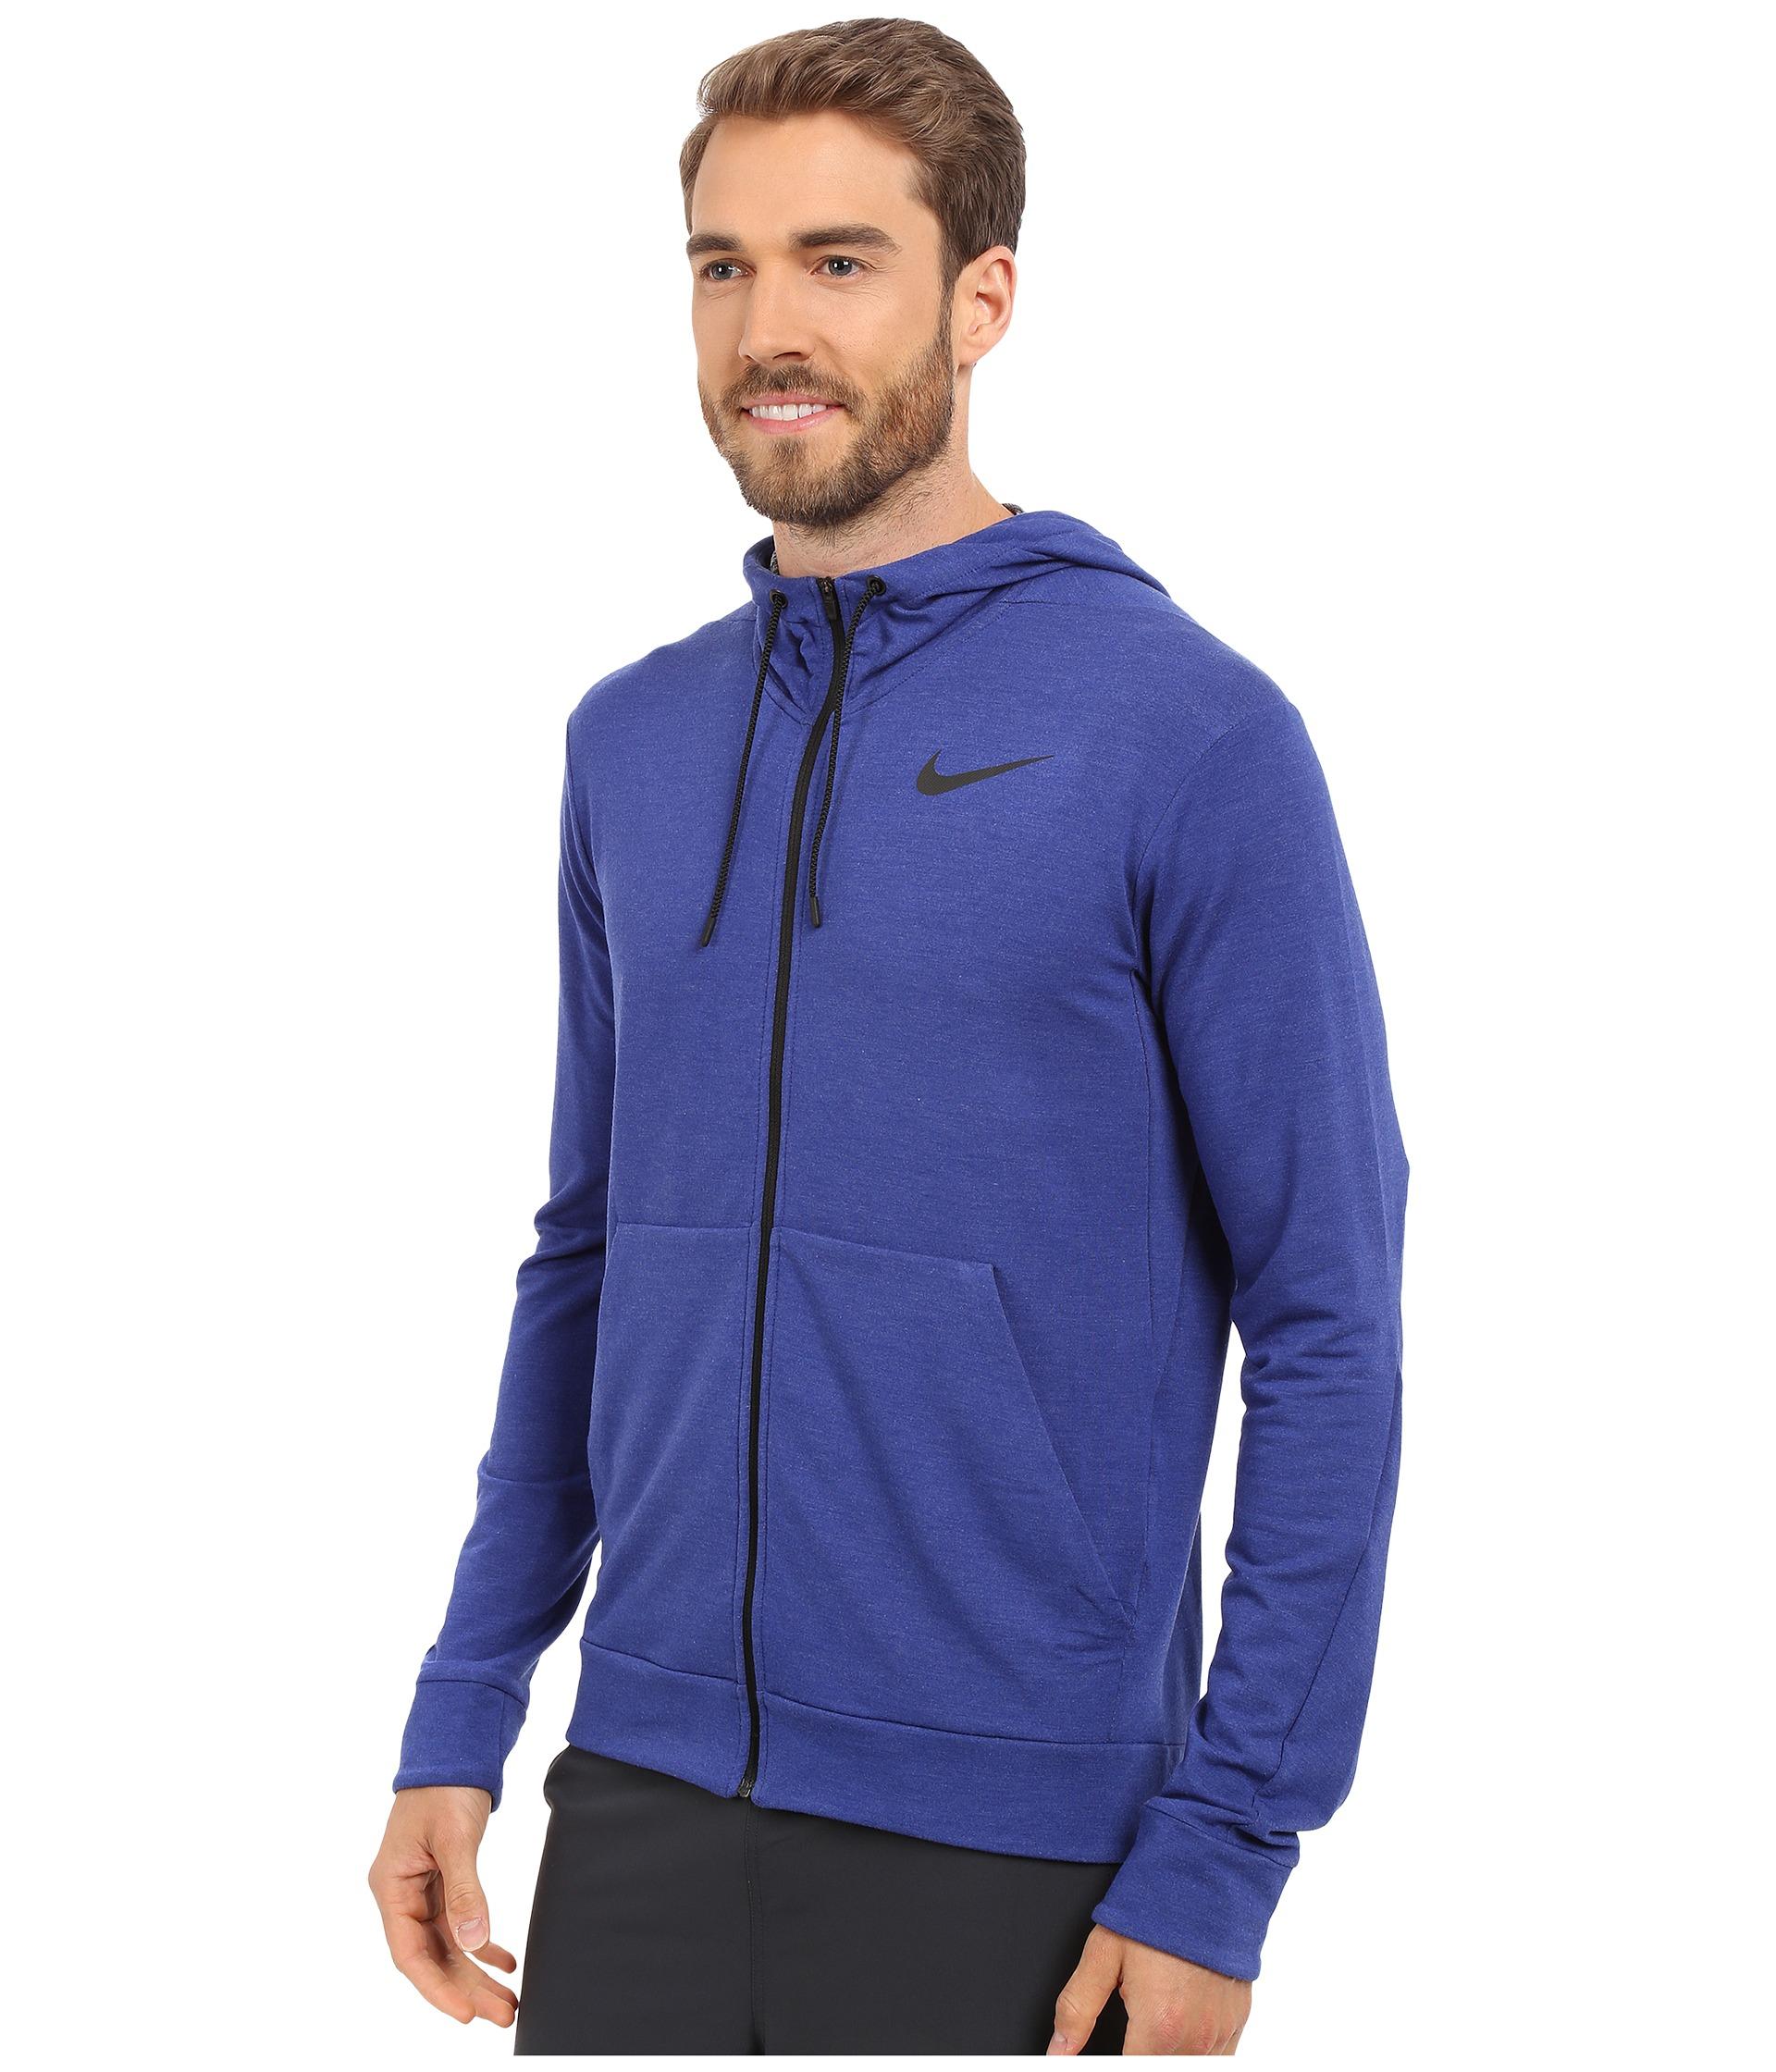 08af6636faf3 Lyst - Nike Dri-fit™ Fleece Full-zip Training Hoodie in Blue for Men